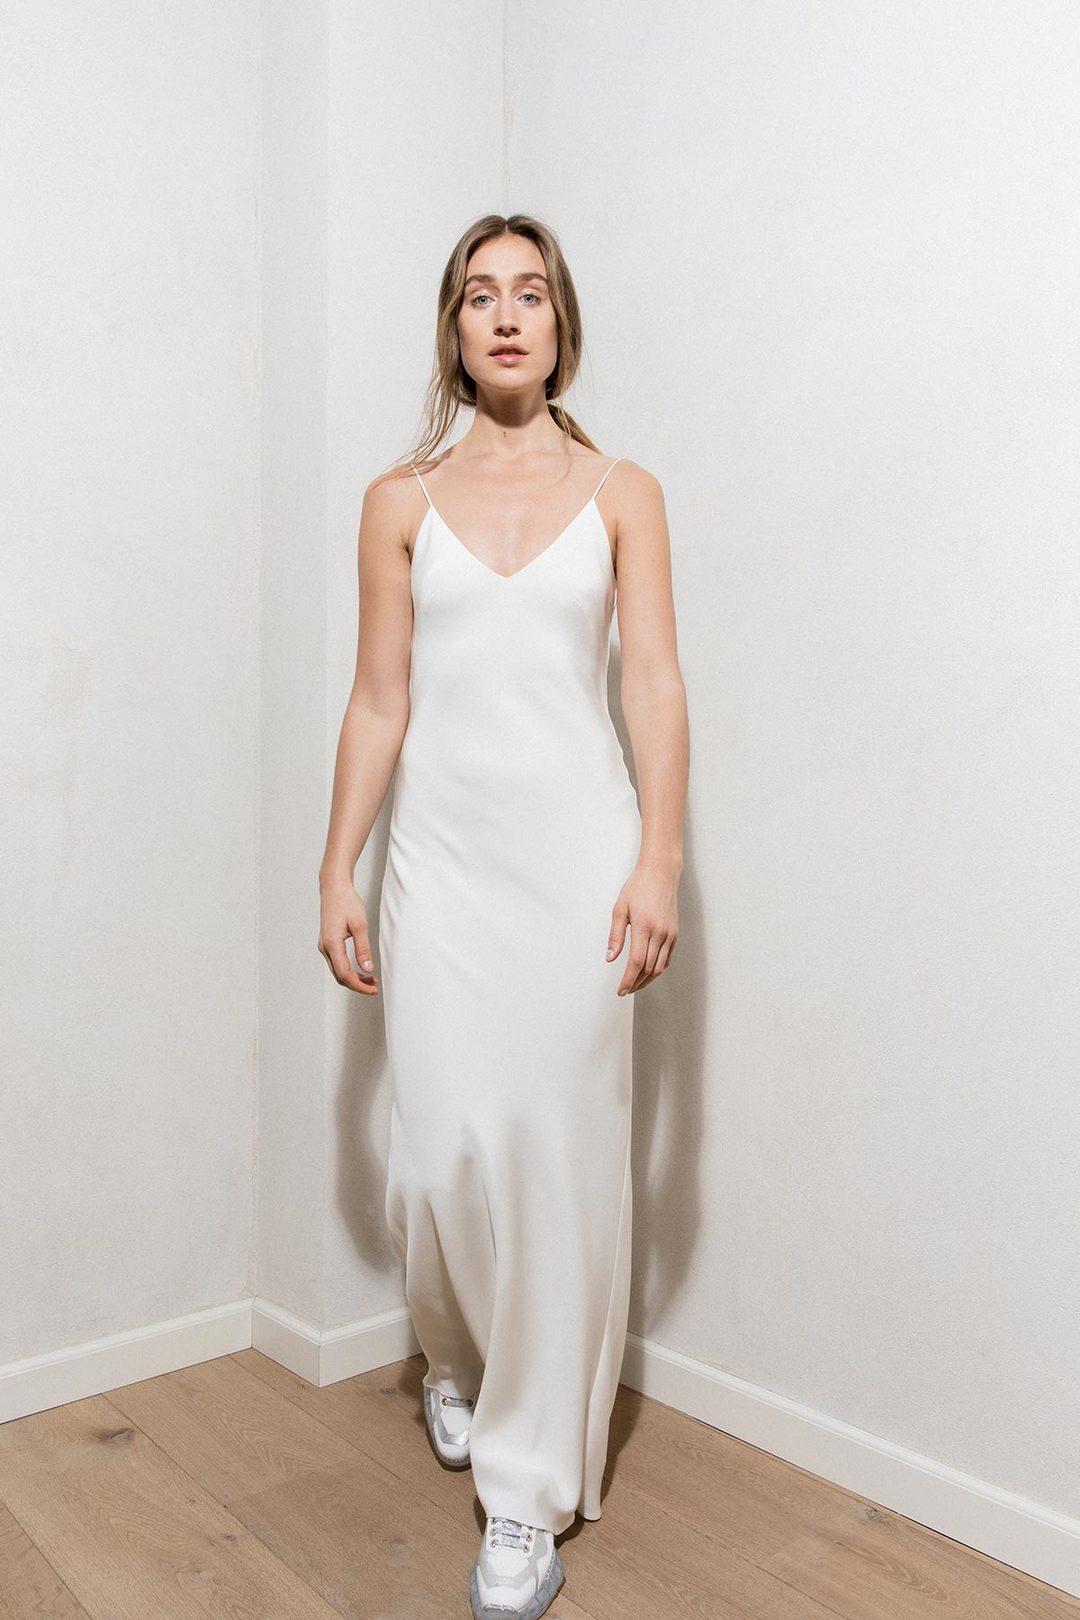 saga dress dress photo